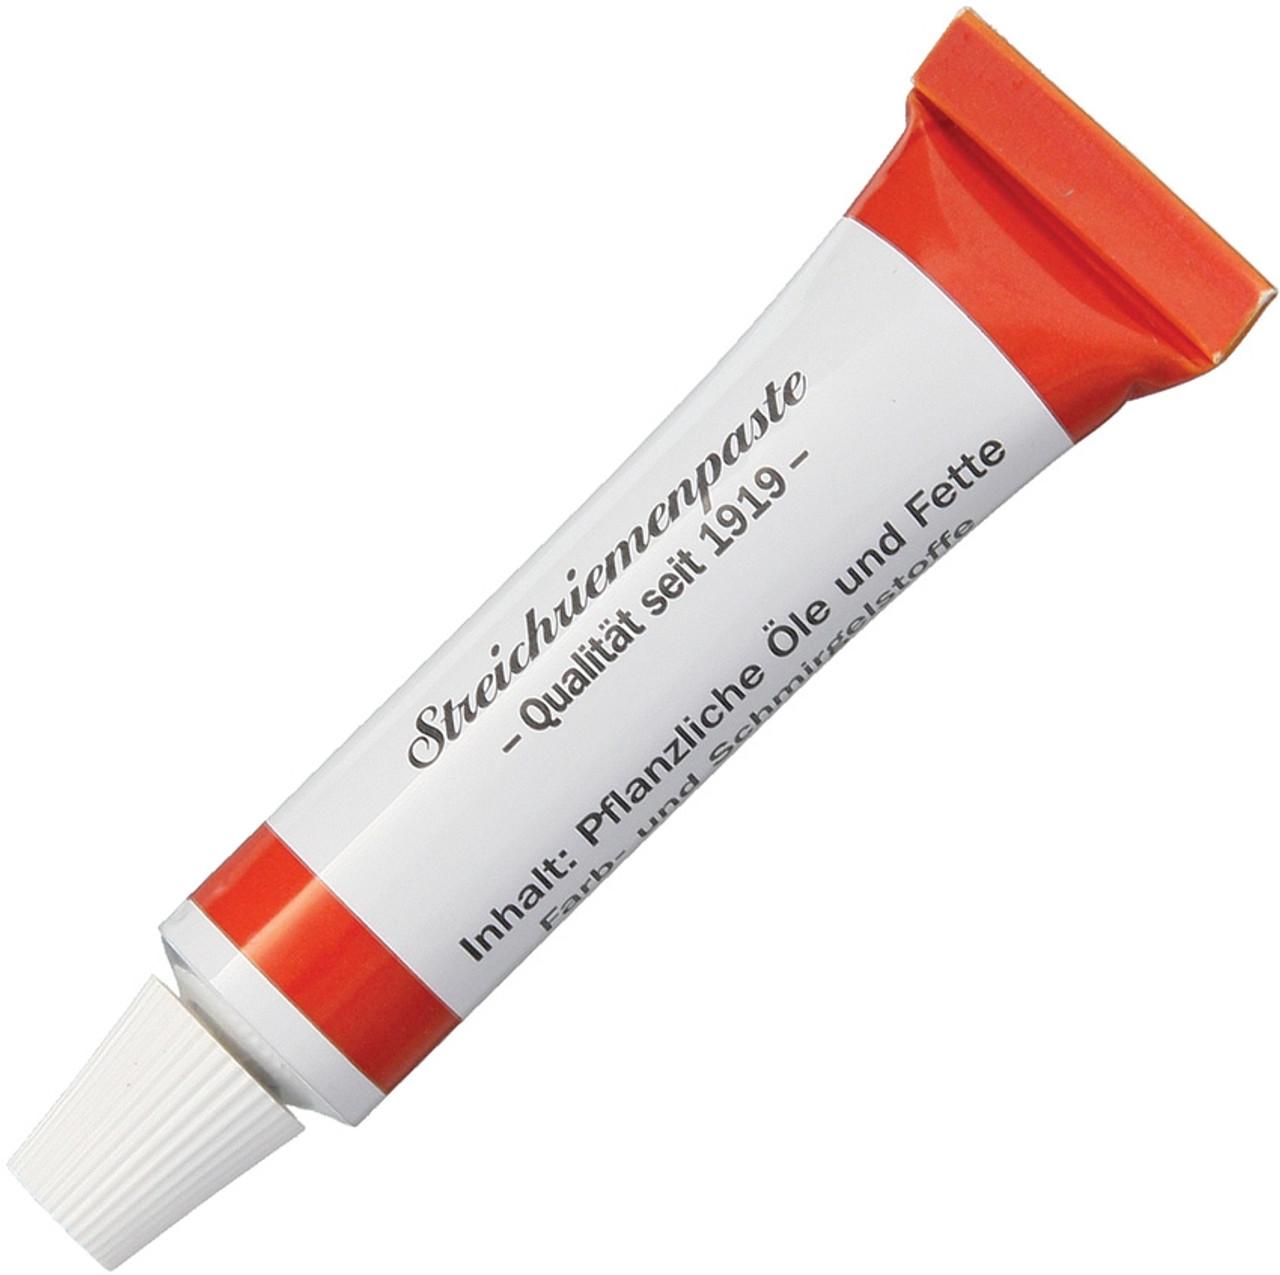 Herold Solingen Tubenpaste for Razor Strops, Red Medium Grid Effect